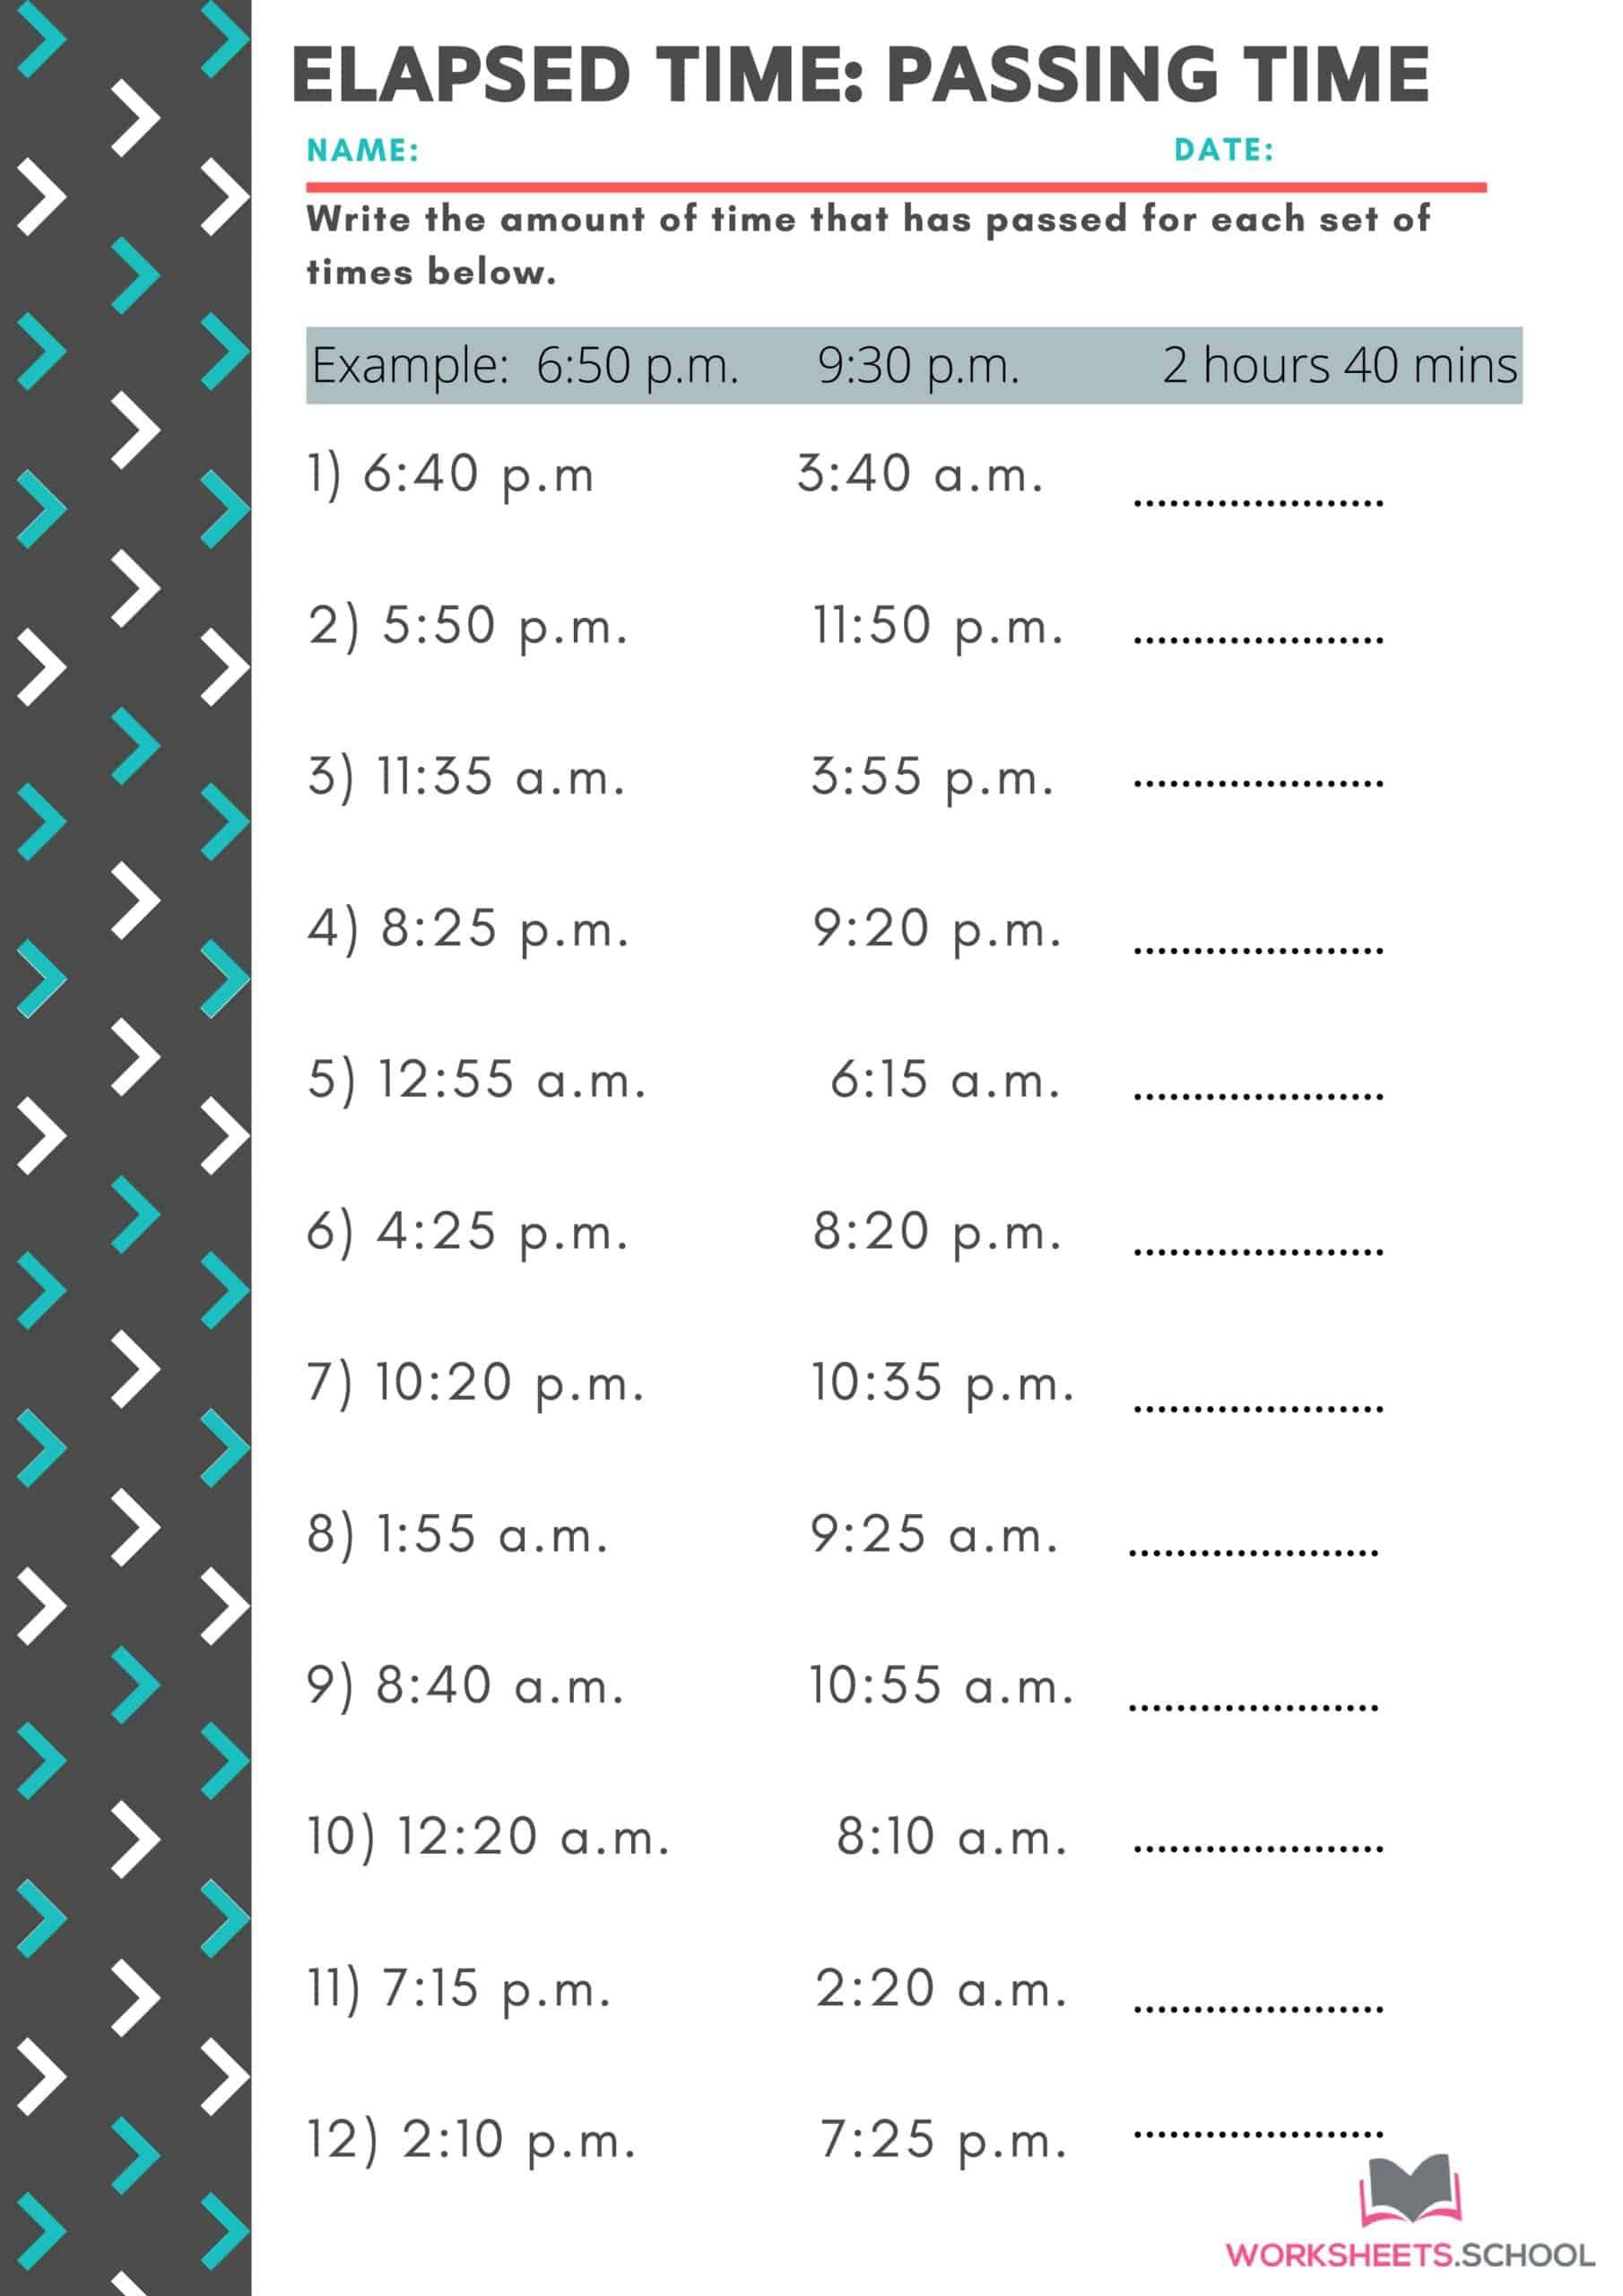 Elapsed Time Worksheet - Passing Time